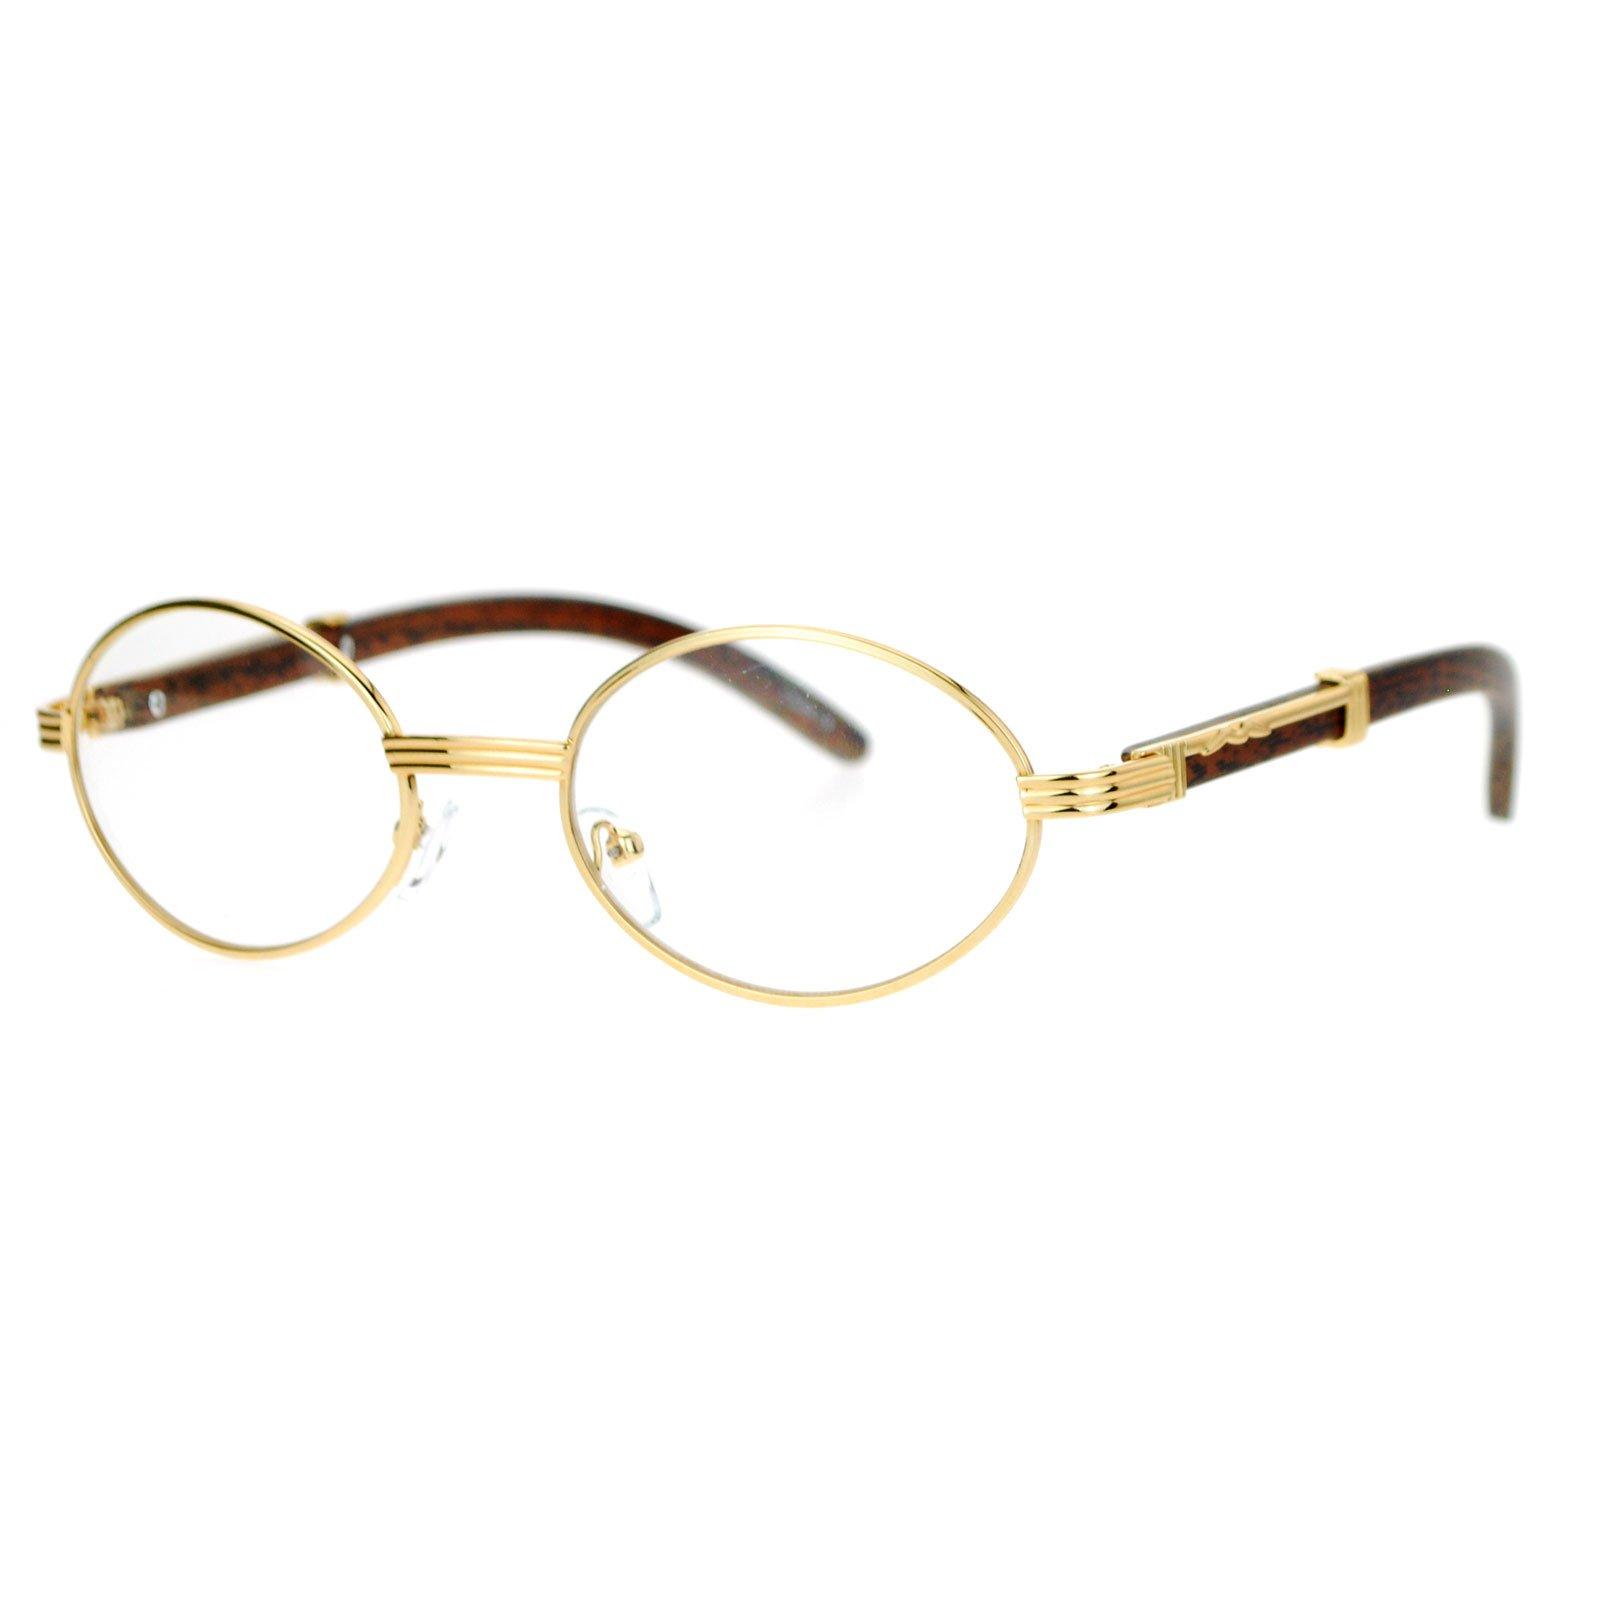 SA106 Art Nouveau Vintage Style Oval Metal Frame Eye Glasses Yellow Gold